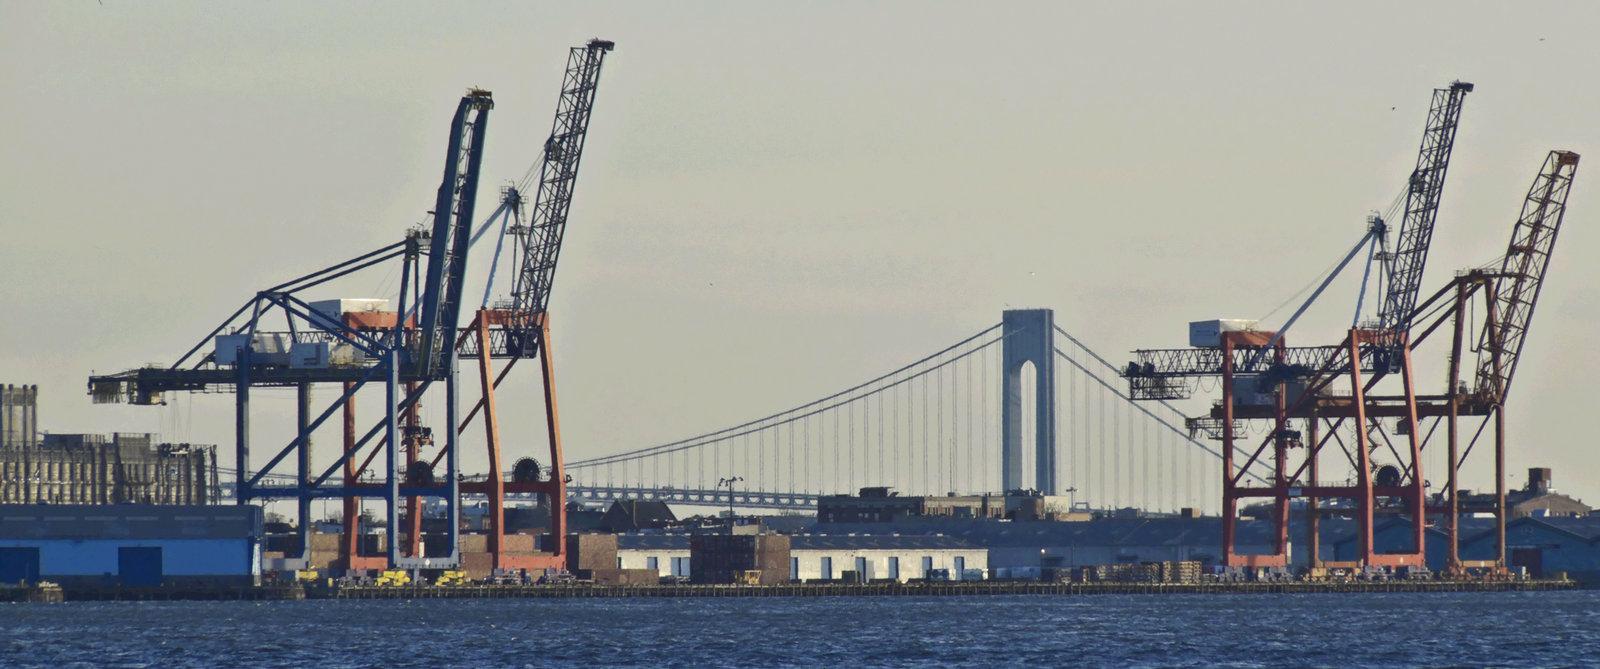 Mariners Harbor Staten Island, NY Private Investigator